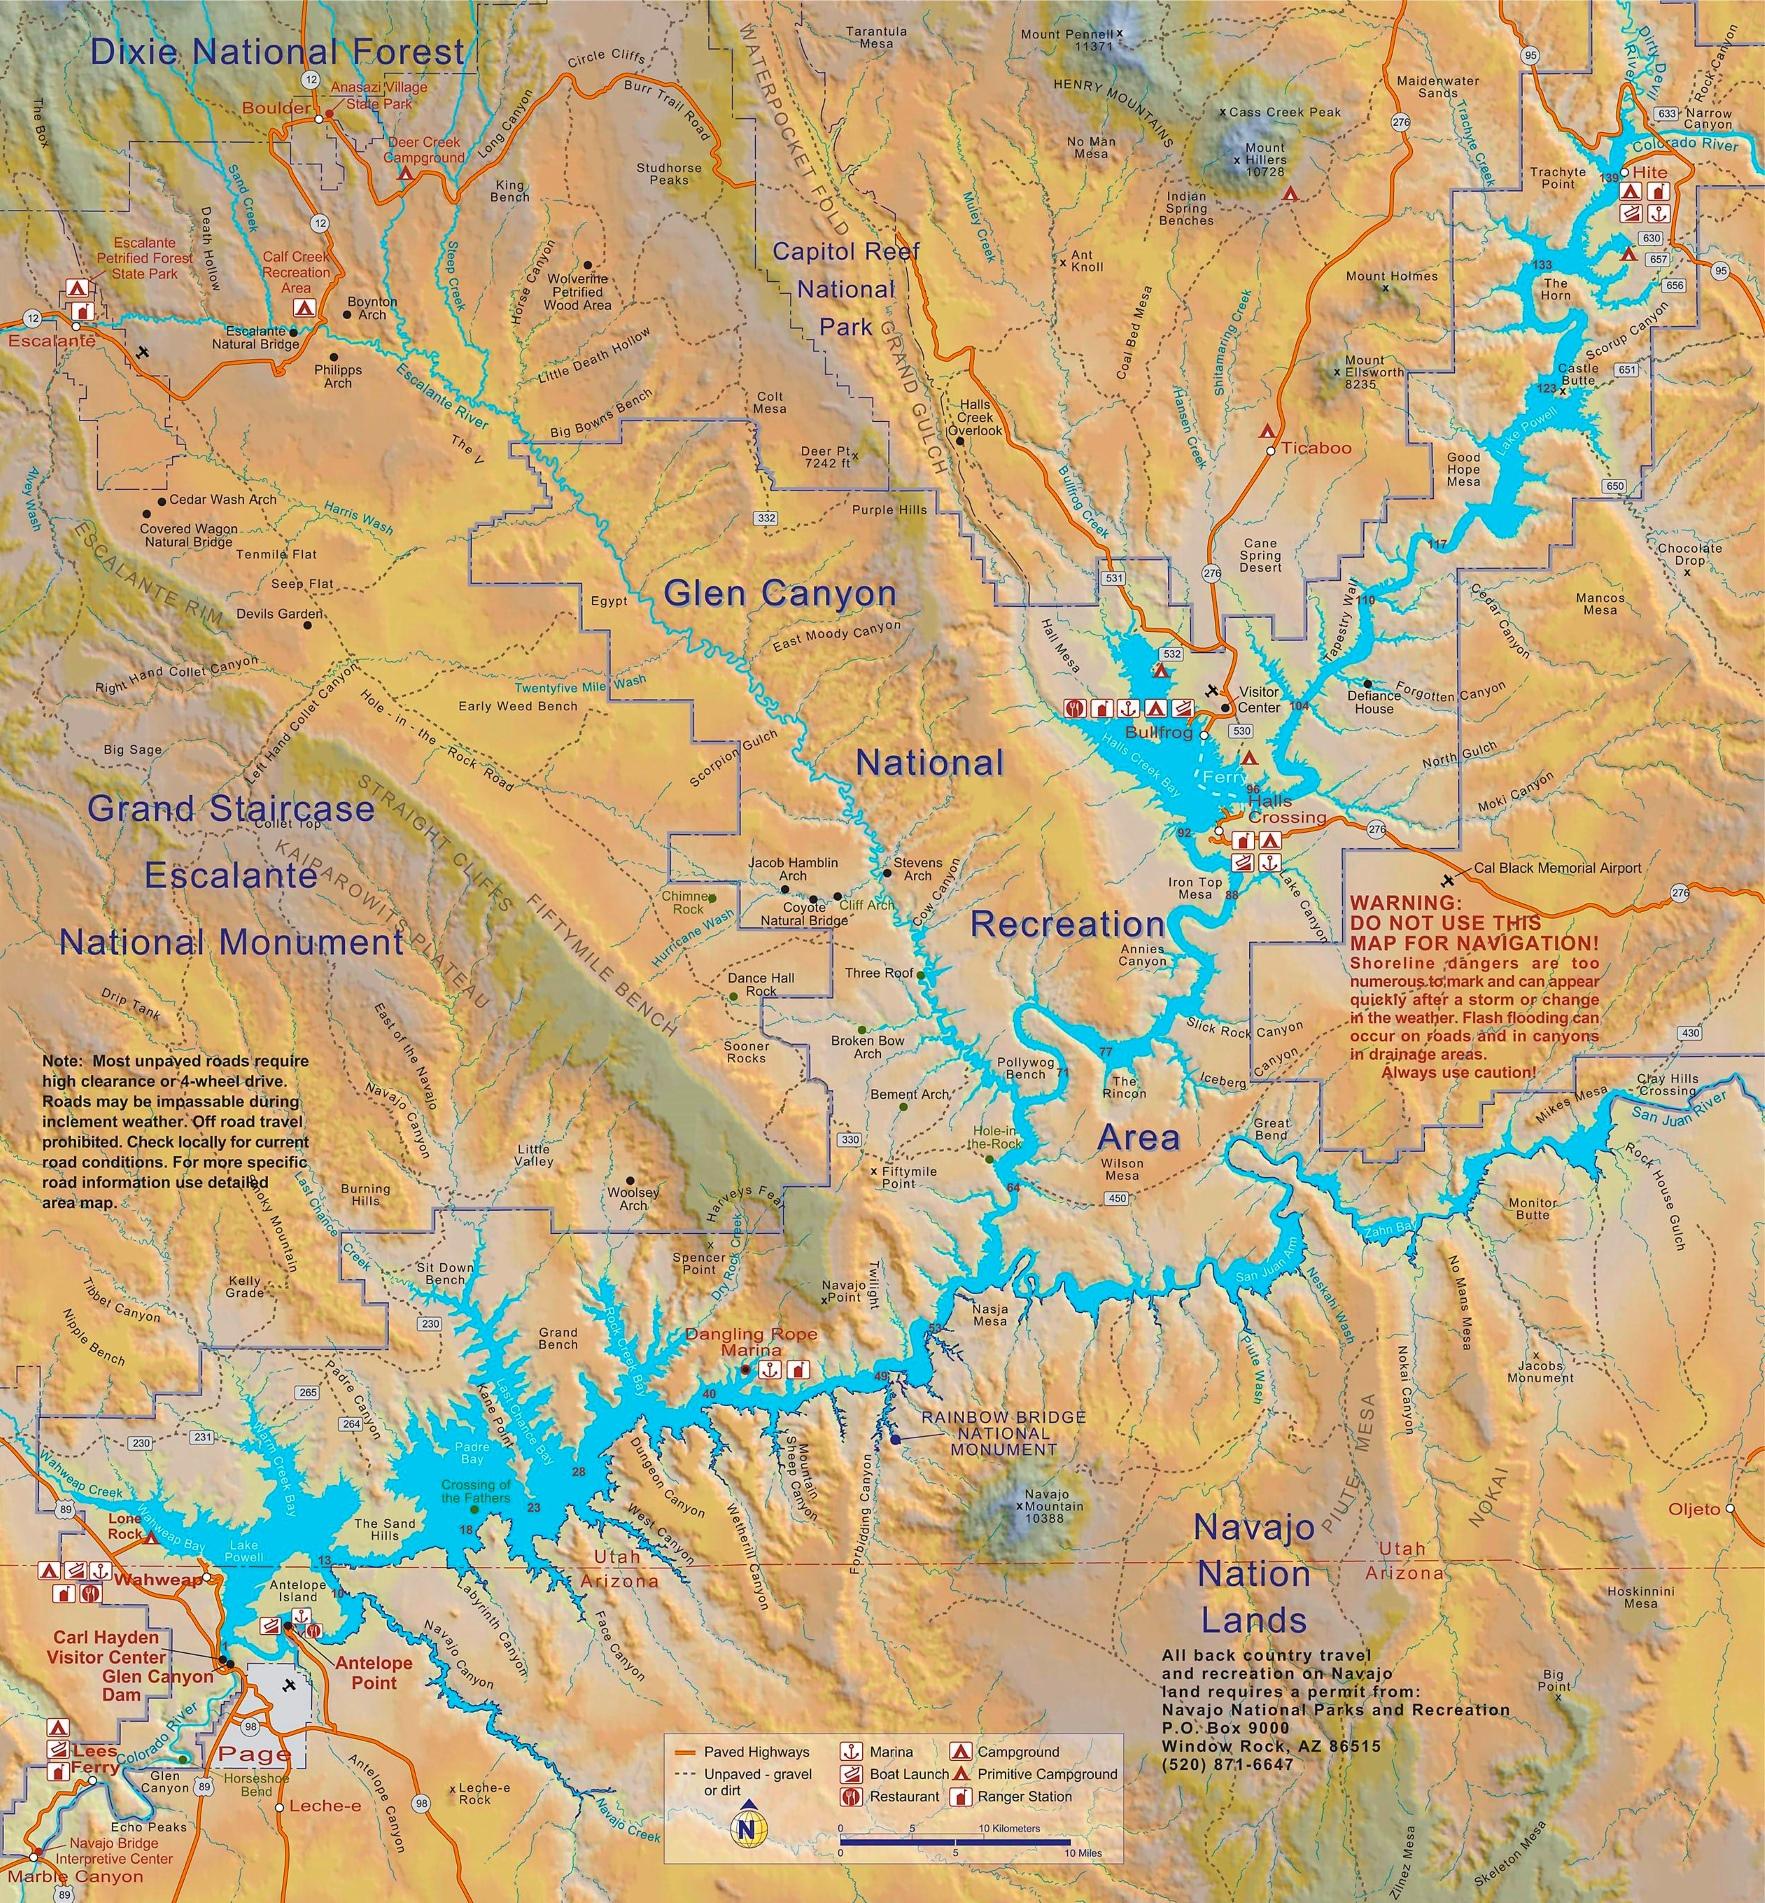 Lake Powell Map Large detailed map of Lake Powell Lake Powell Map